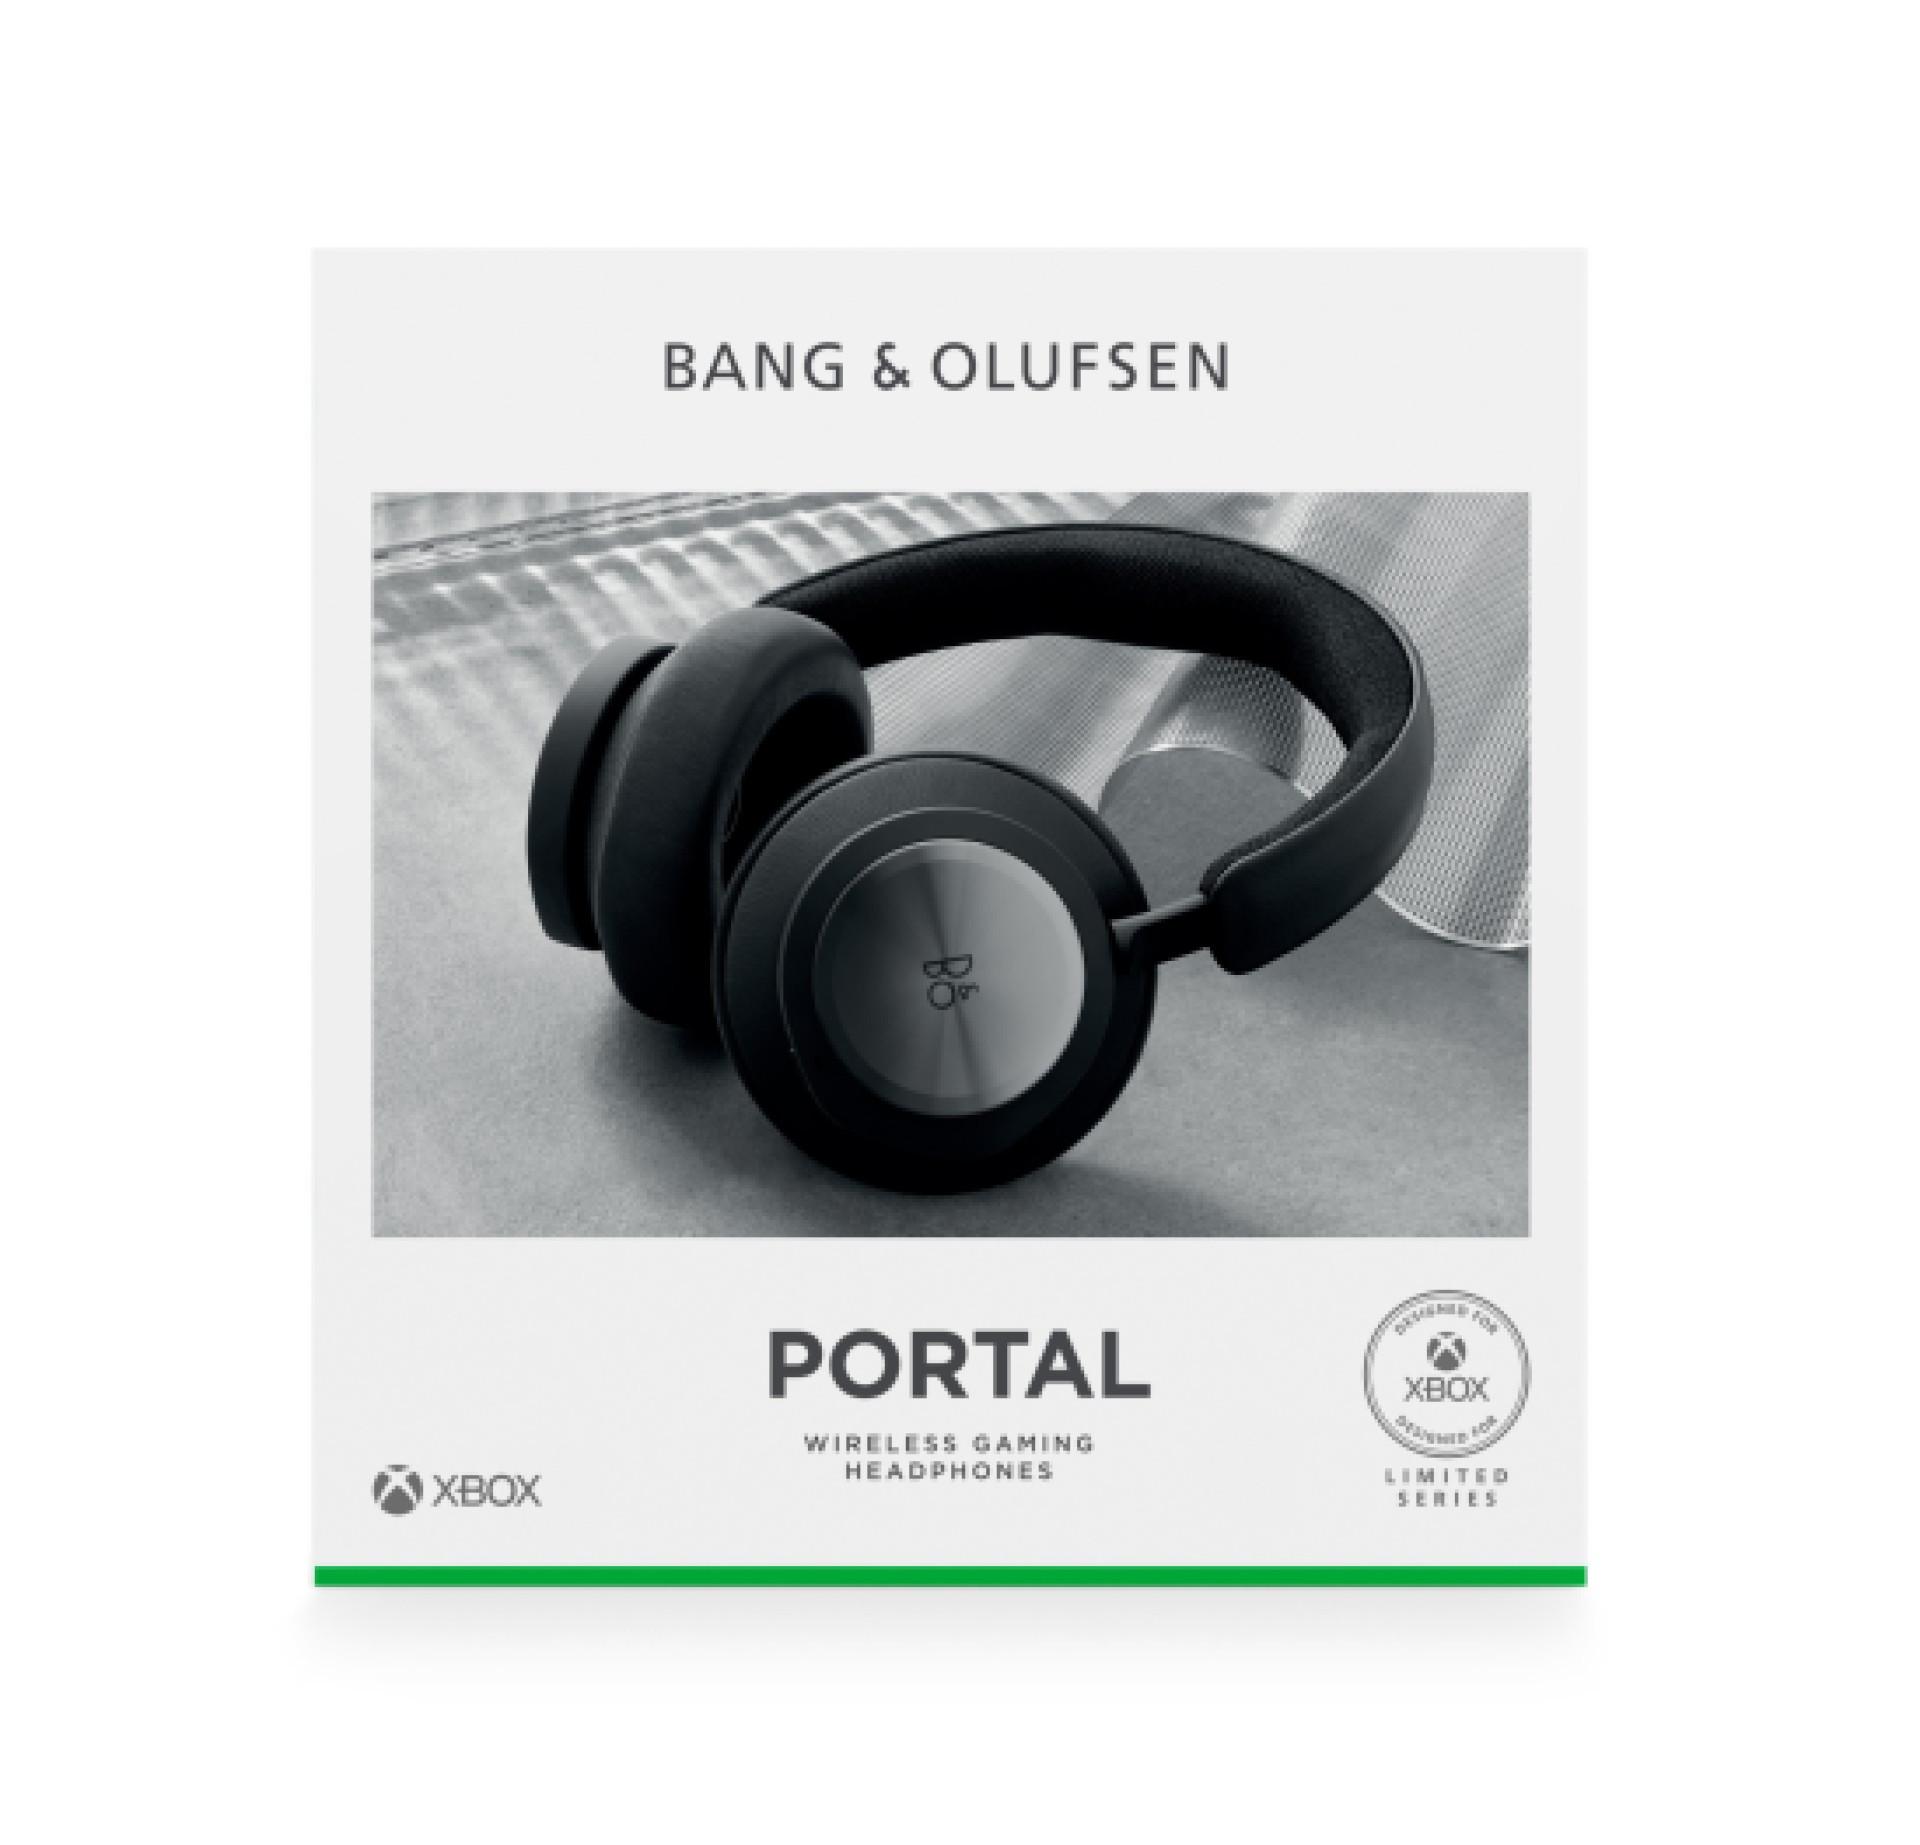 HP Bang & Olufsen E273M Beoplay-Portal_Black_Packaging_Front_JPG.jpg